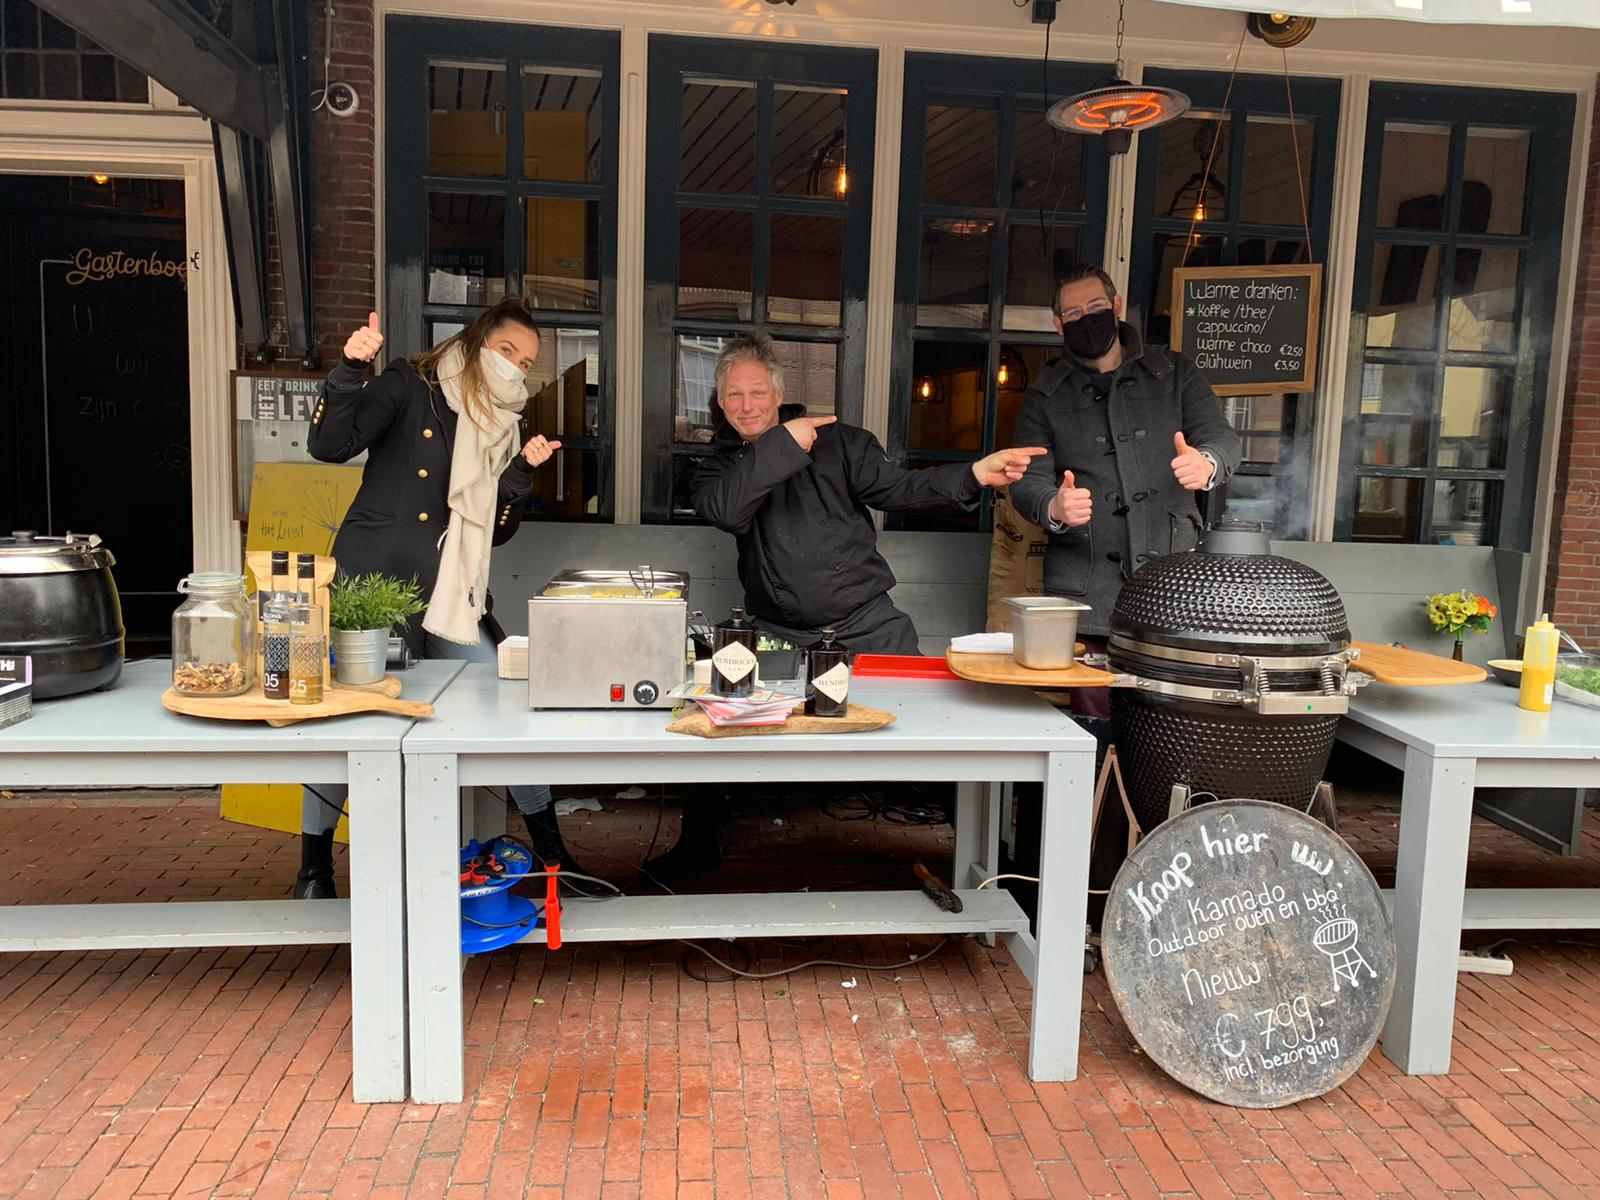 Culinair take away wandelen nu mogelijk in Amersfoort